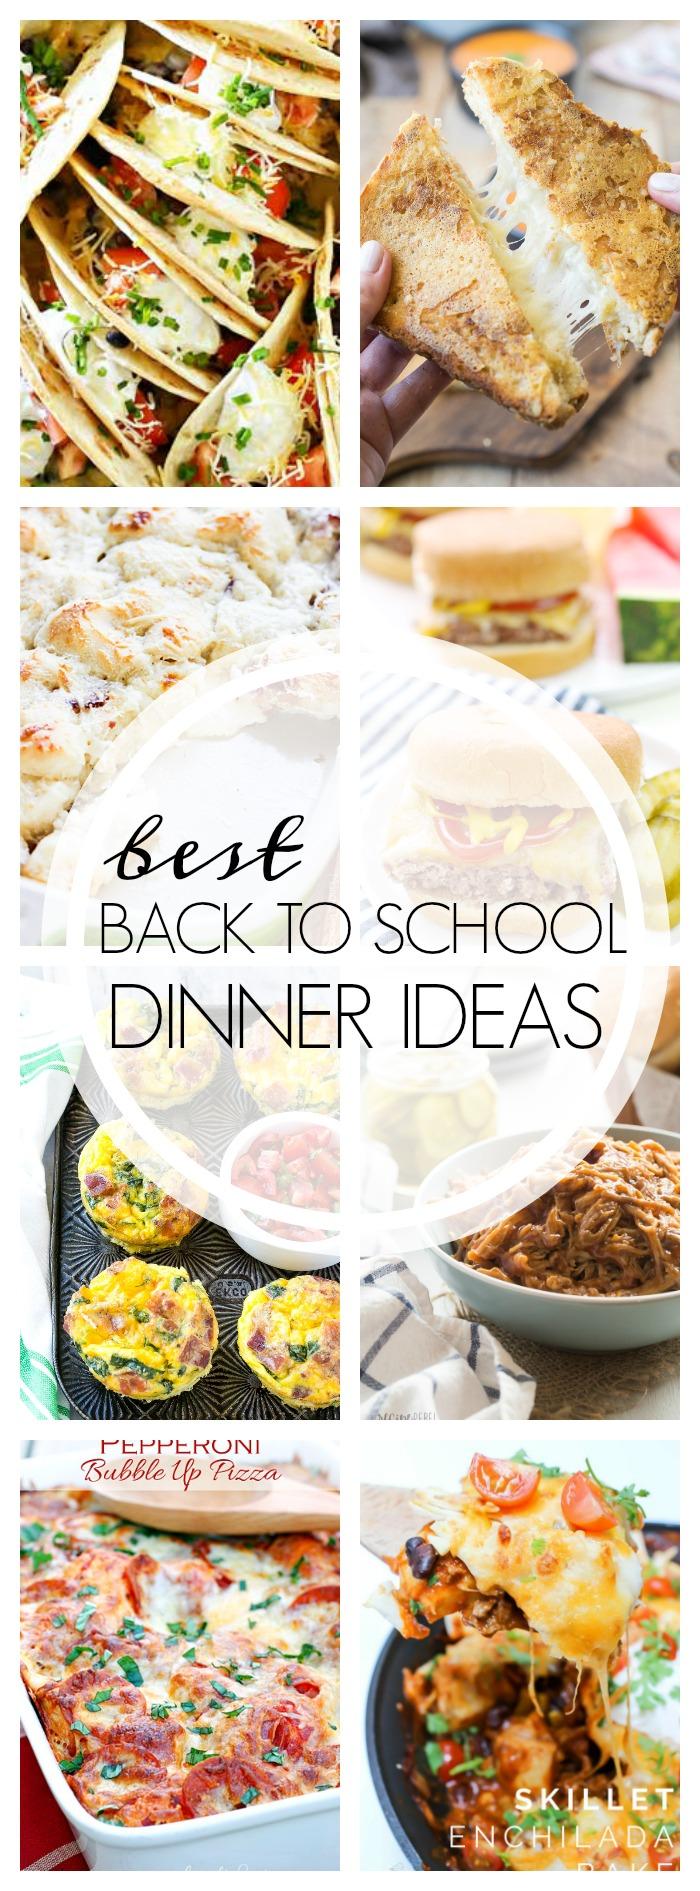 Back to school dinner ideas